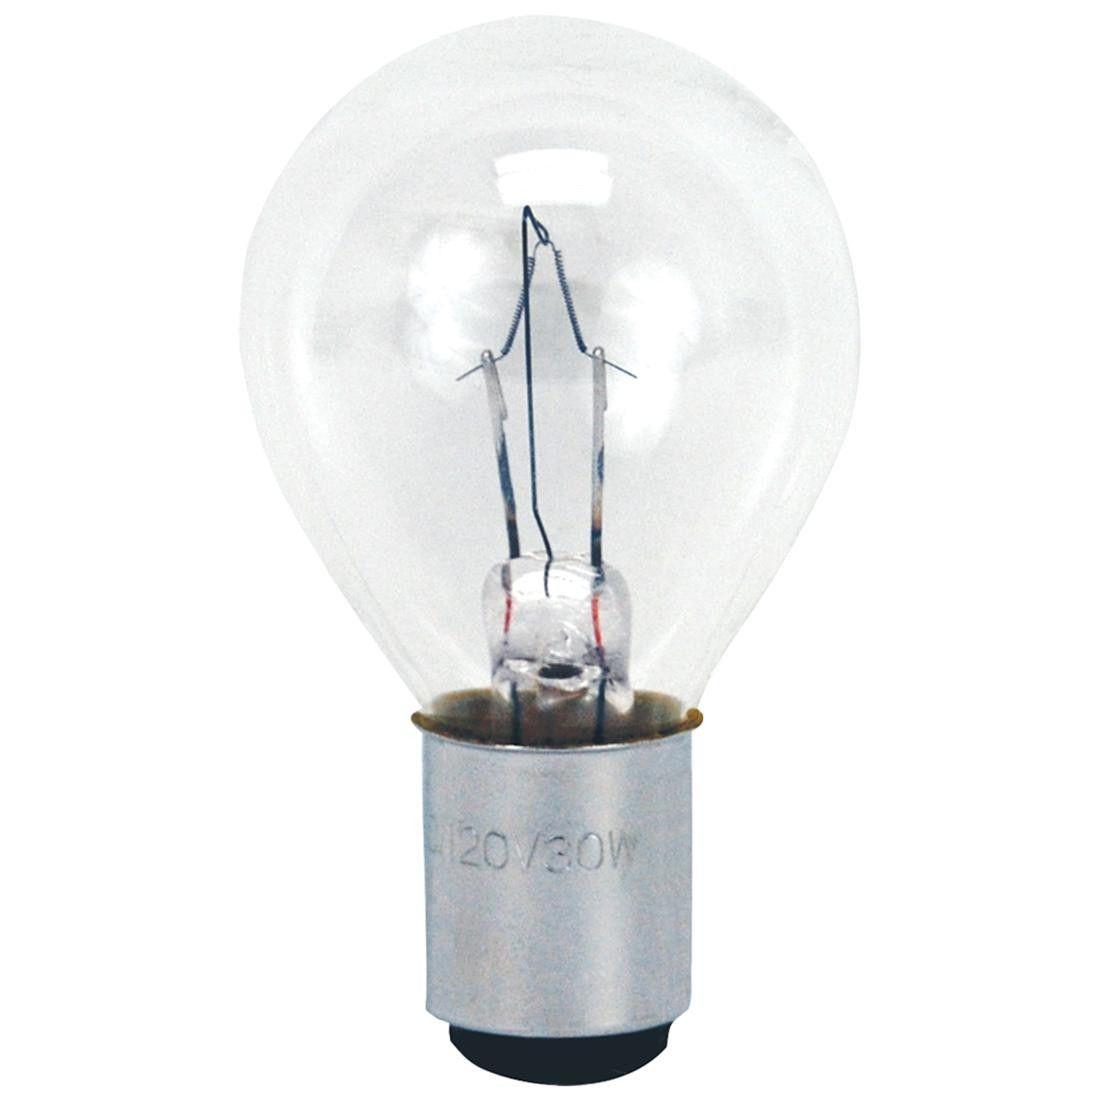 Cod.BLC - Lâmpada BLC 120V 30W   - lampadas.net